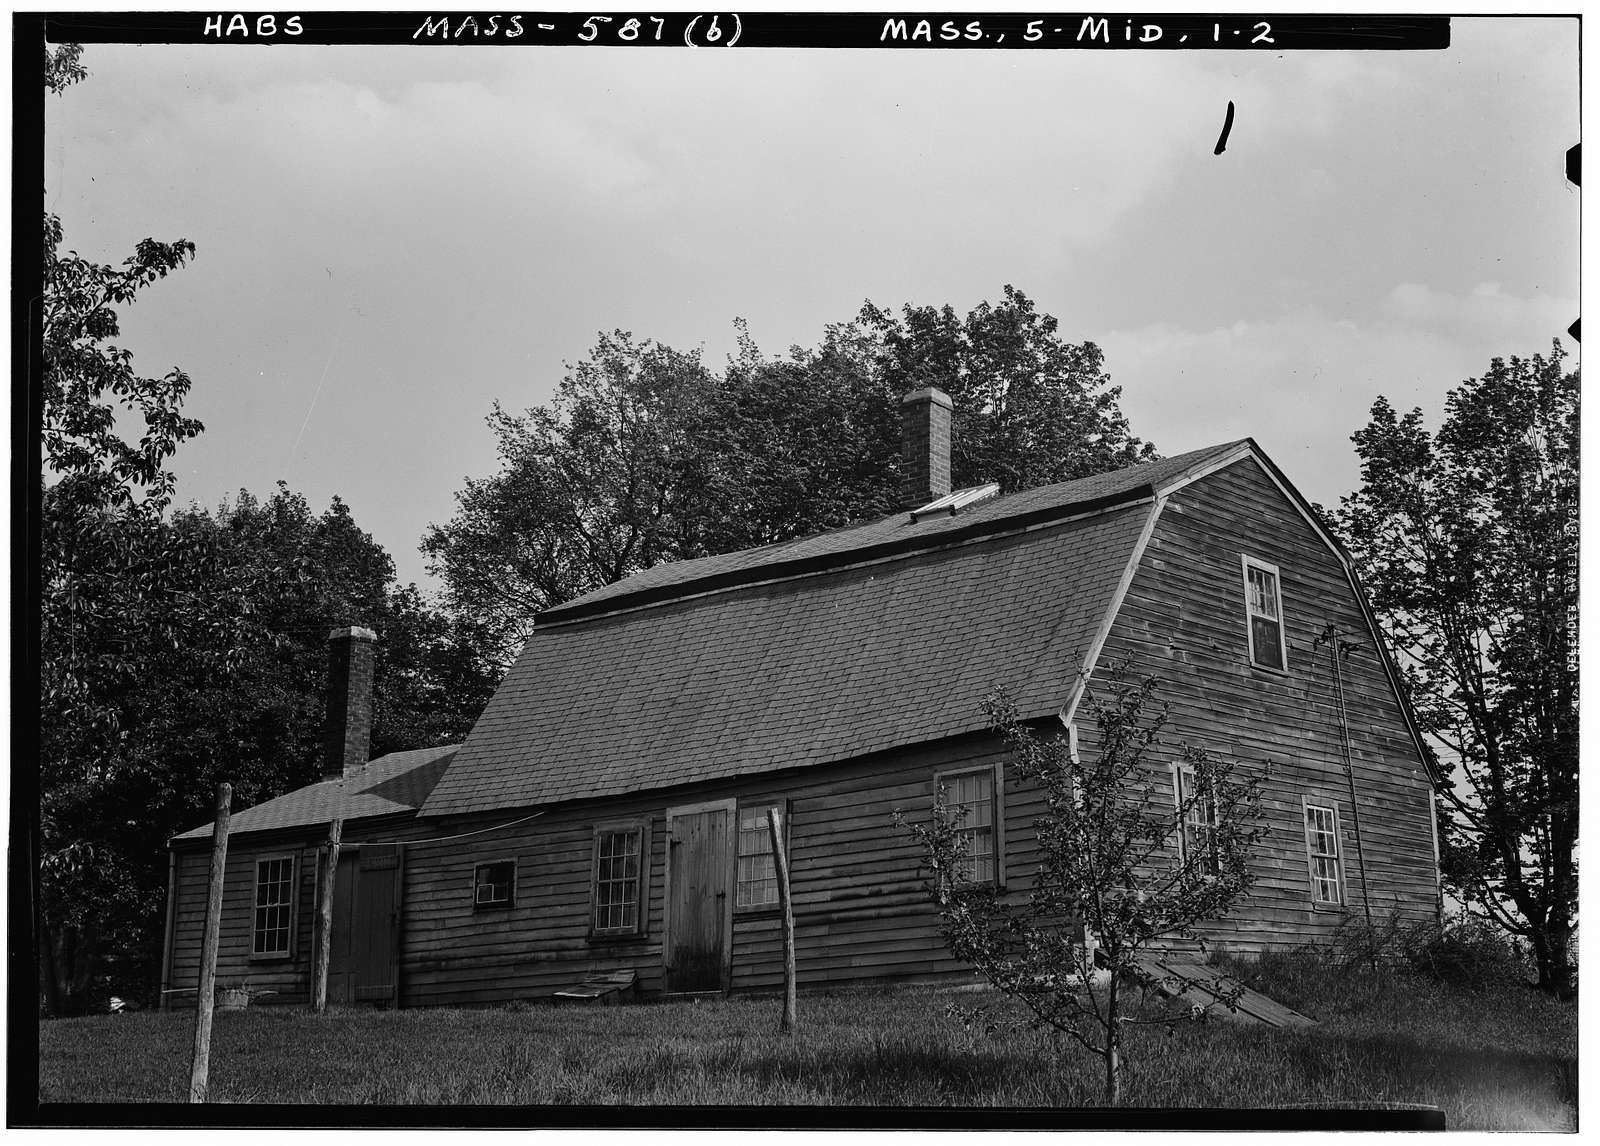 Bradstreet House, Middleton, Essex County, MA